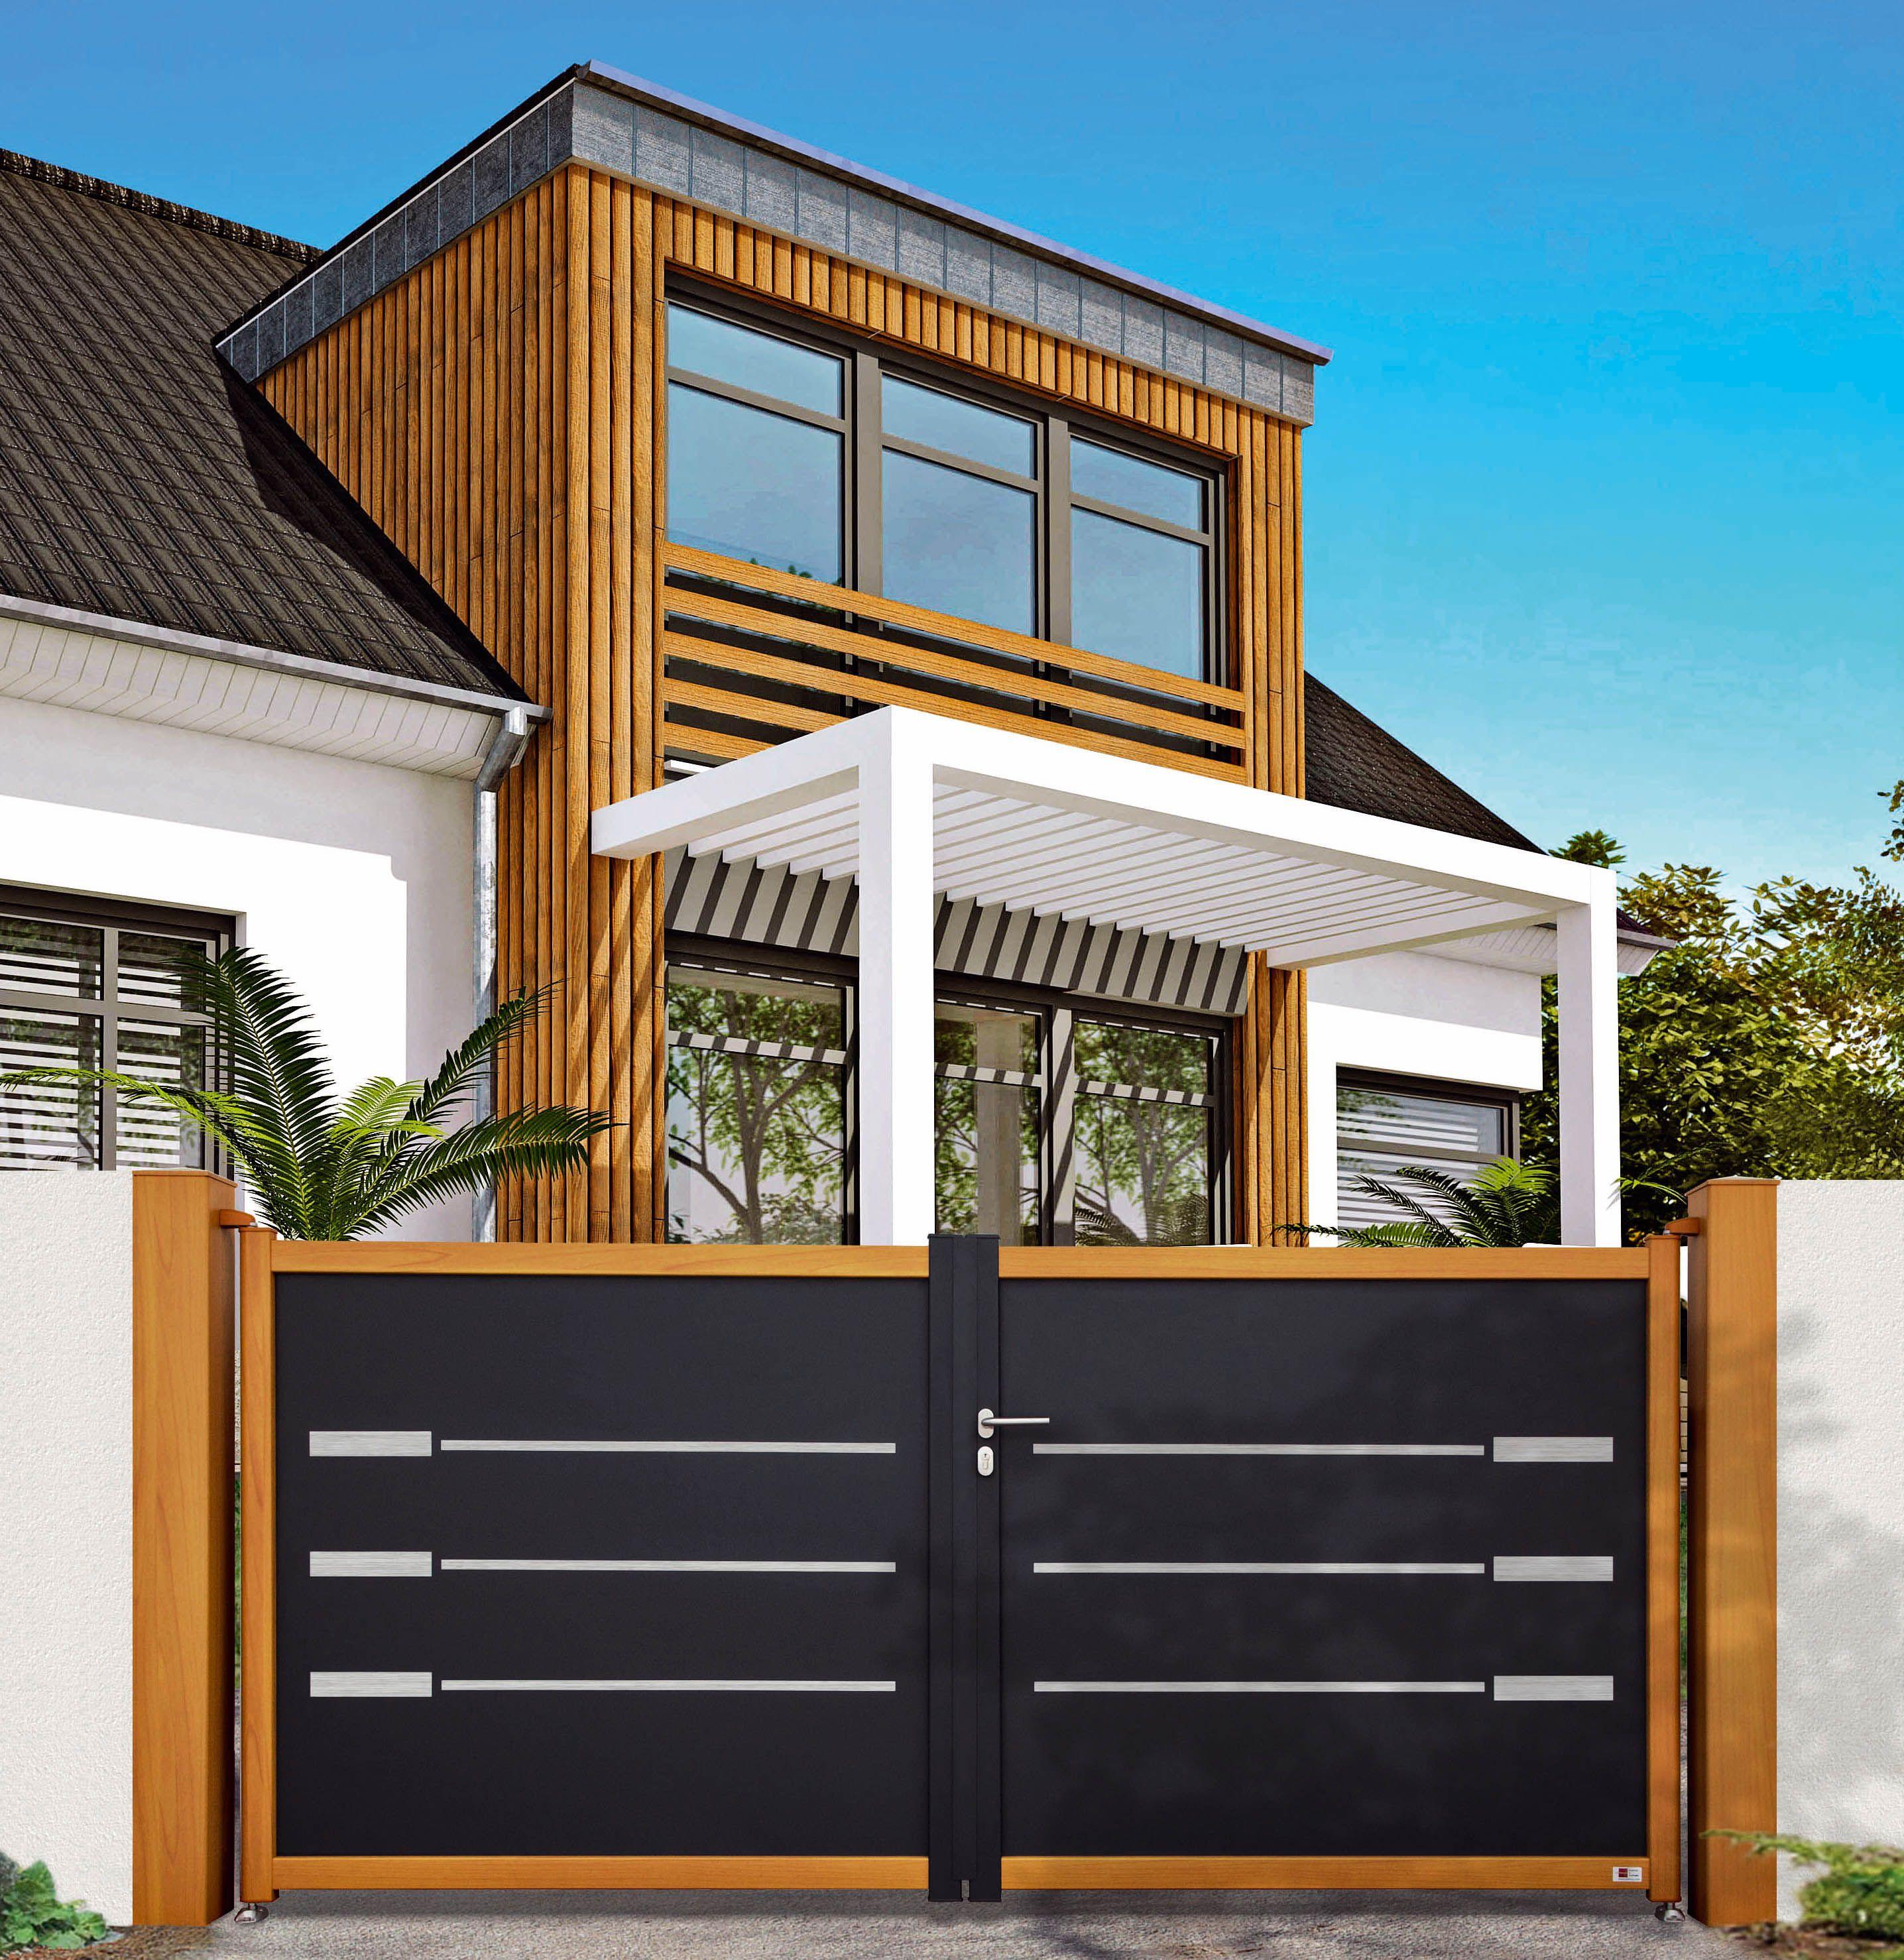 cofreco portail filigrane structure alu aspect bois inserts alu bross. Black Bedroom Furniture Sets. Home Design Ideas